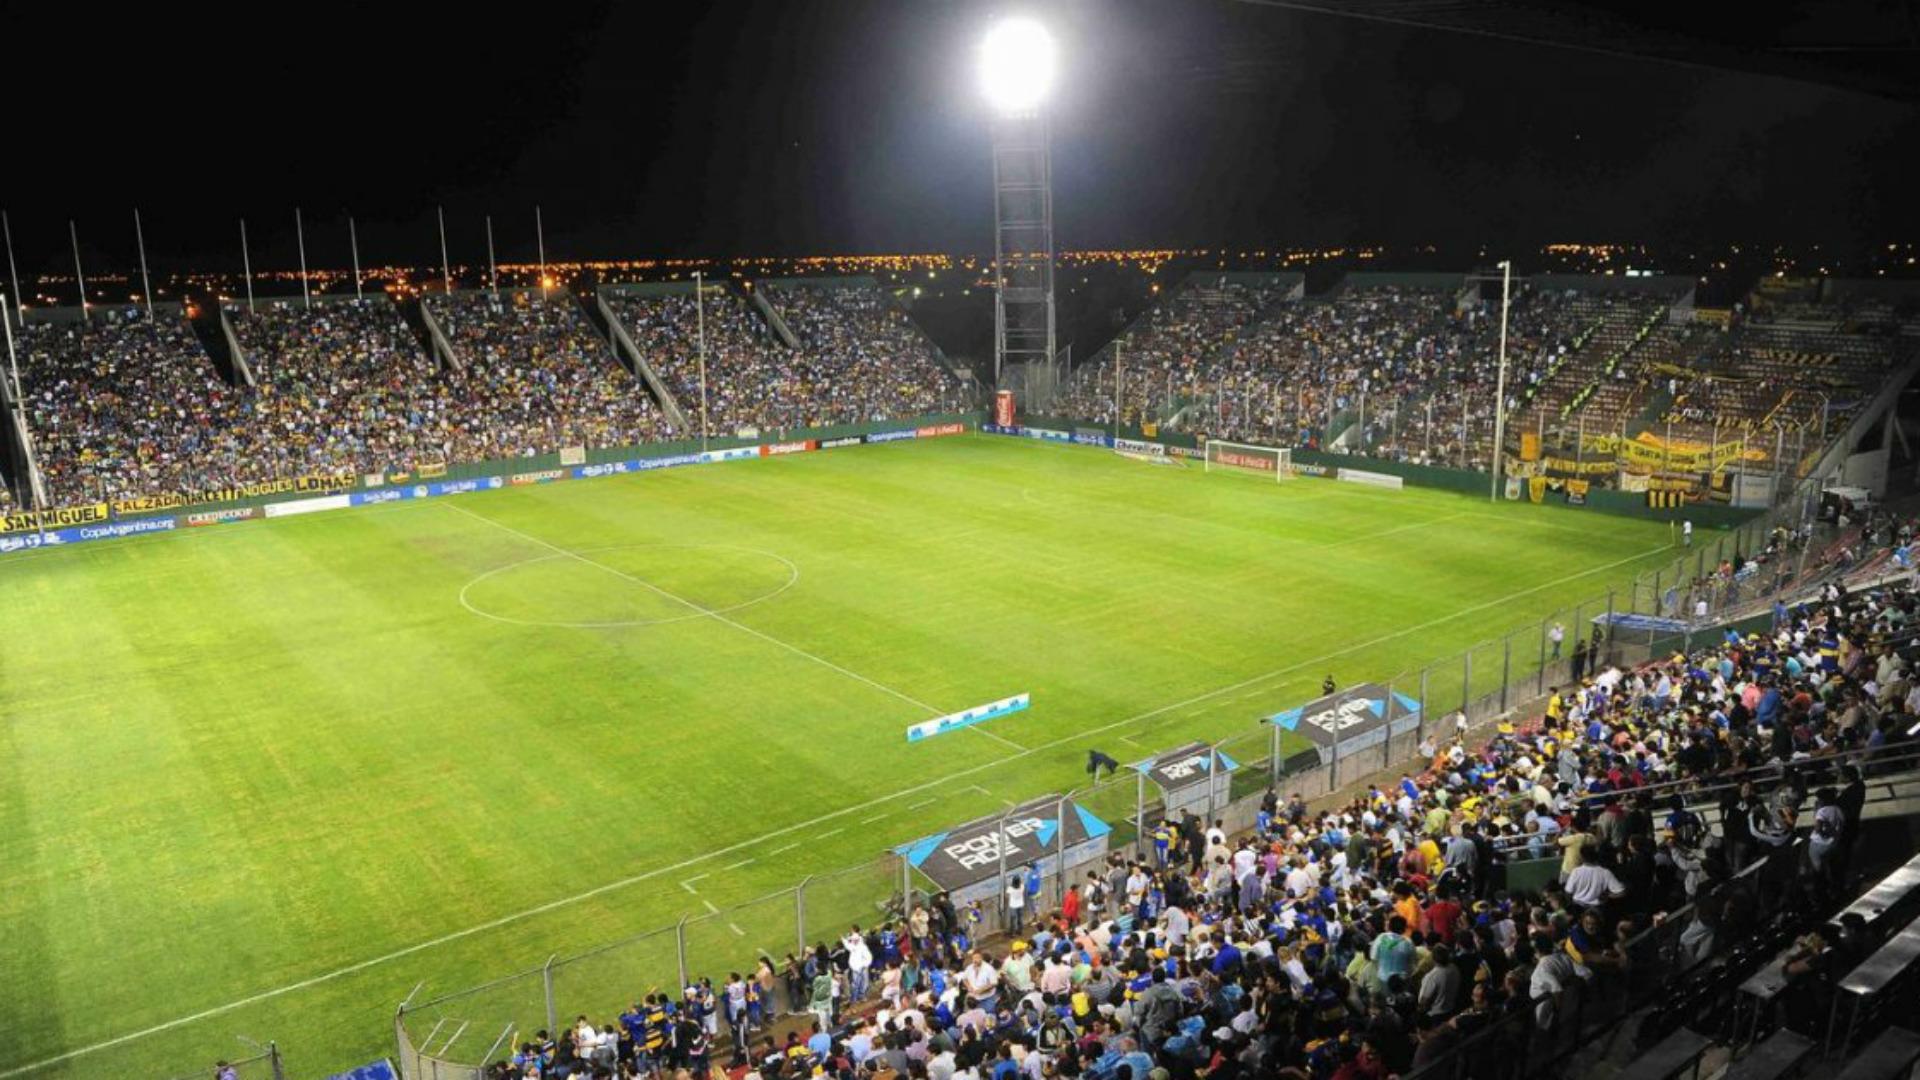 Estadio Padre Ernesto Martearena Salta